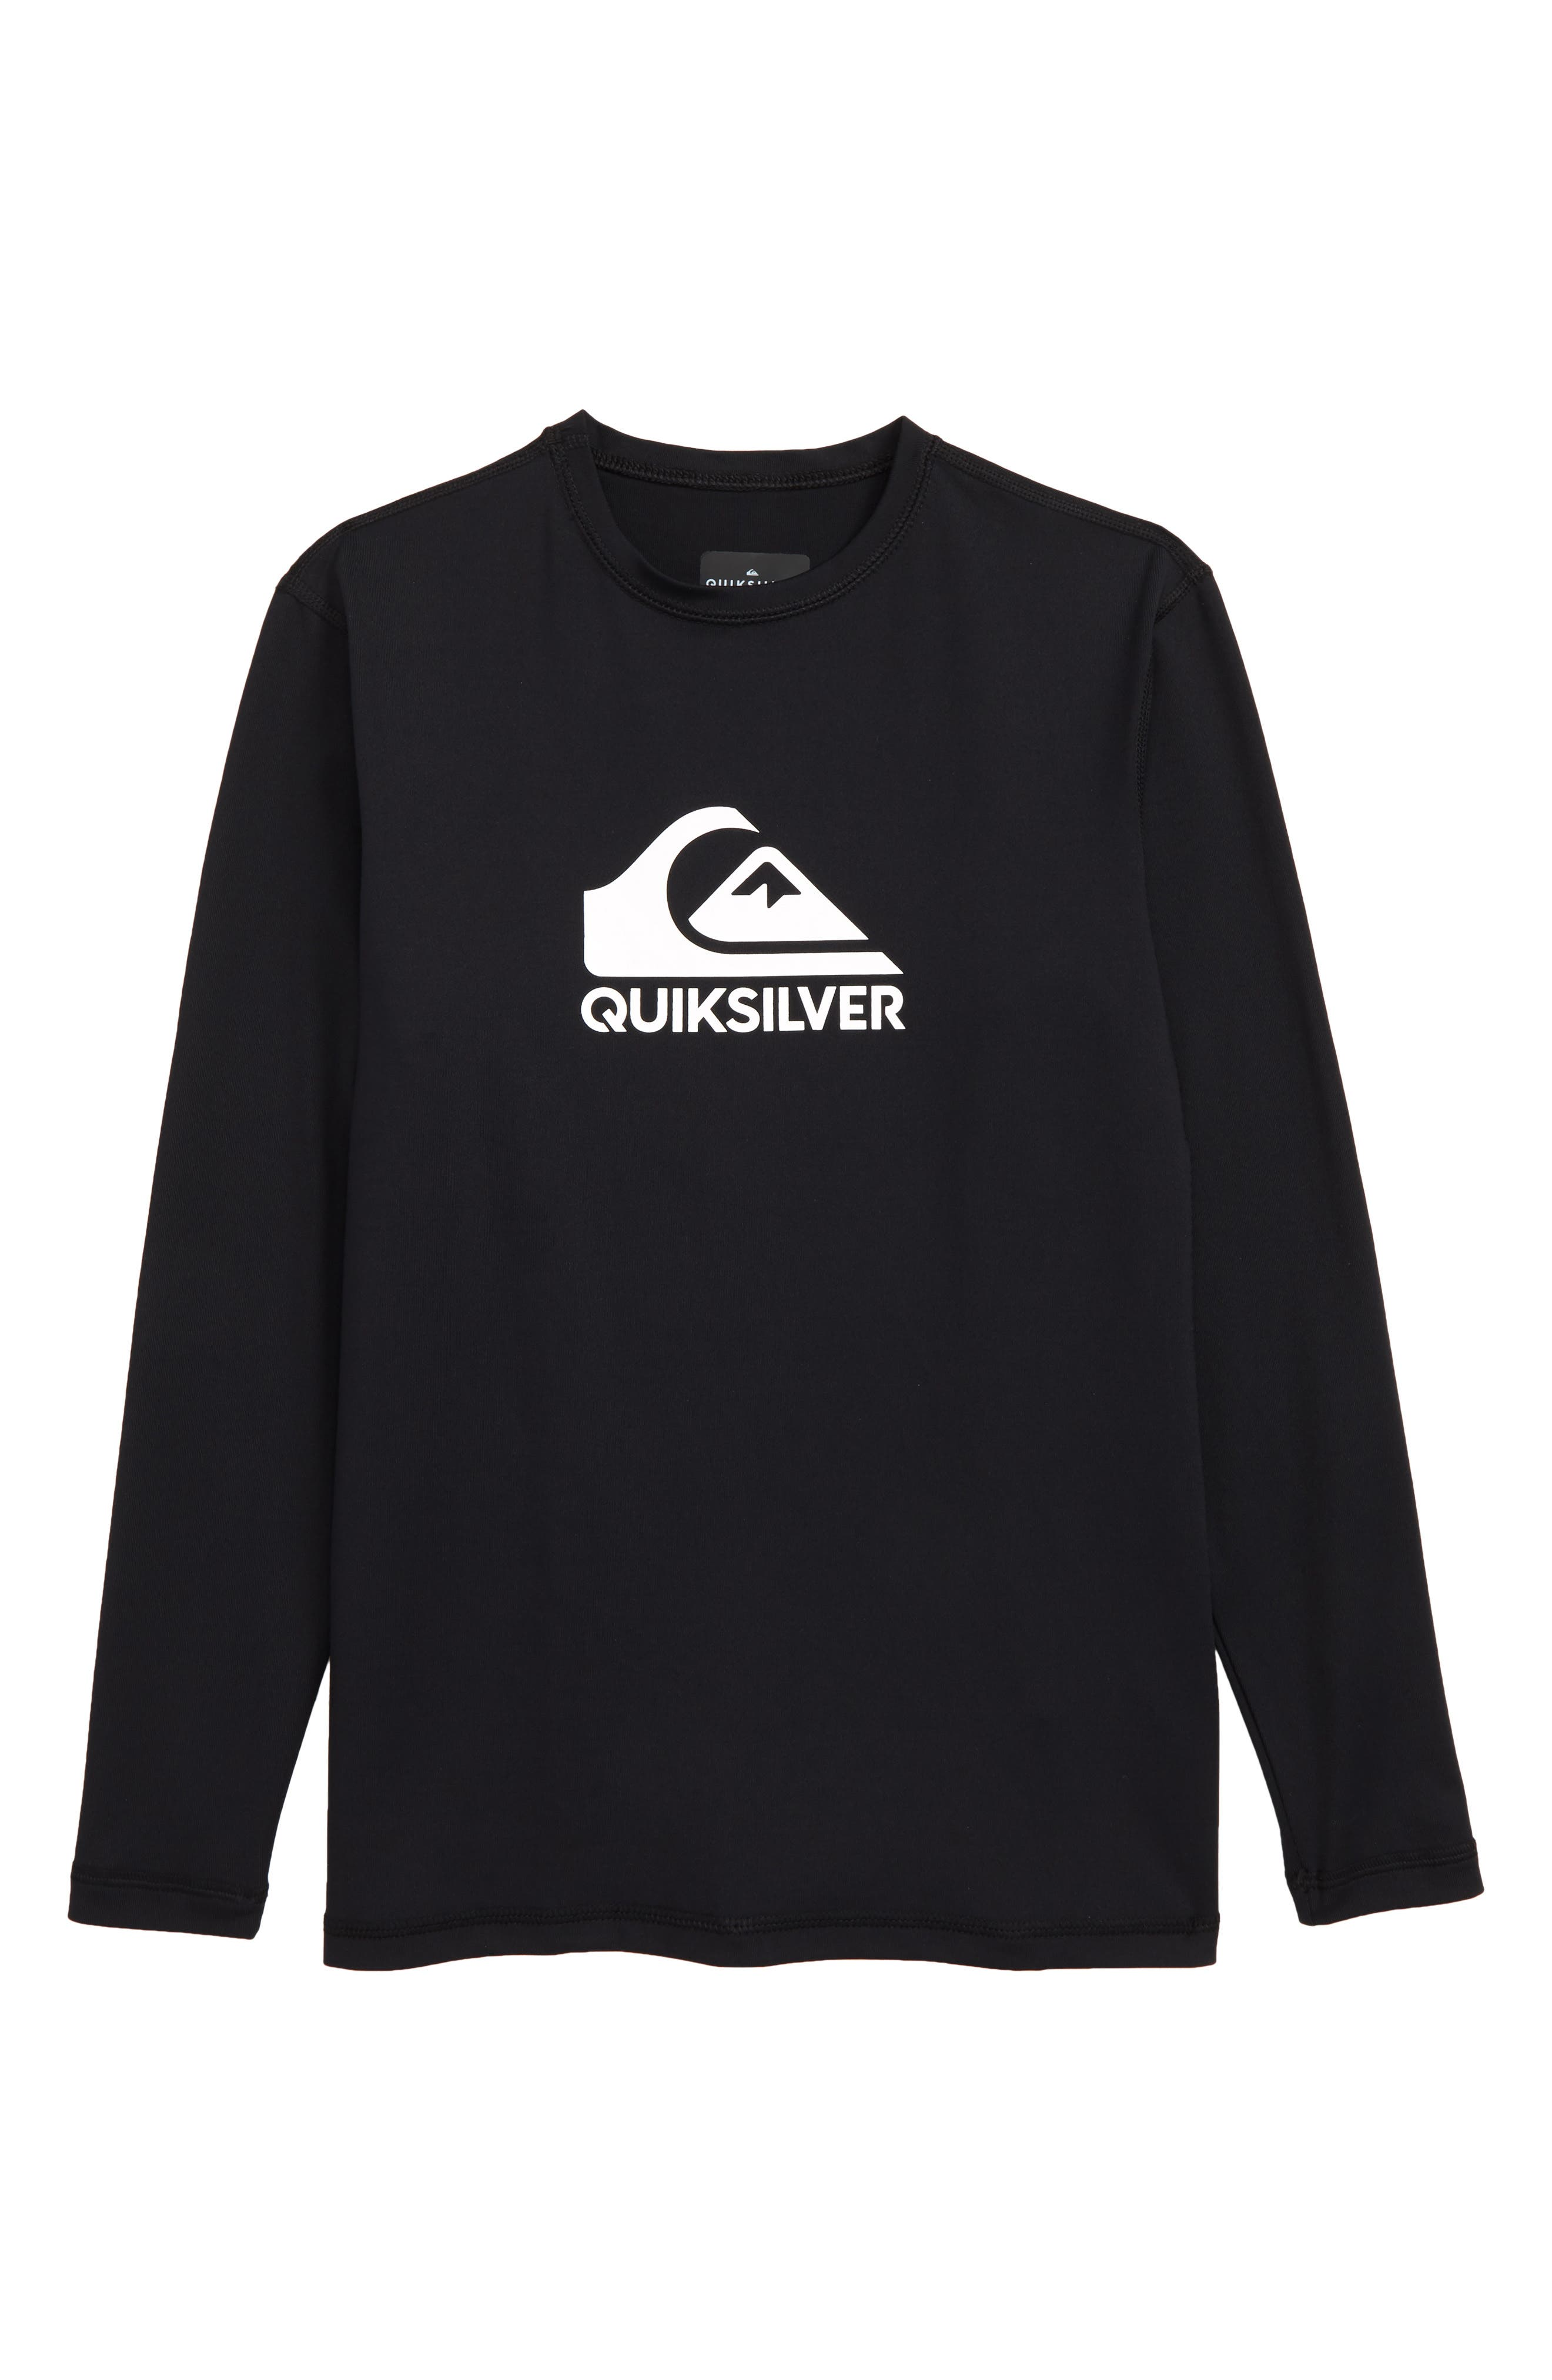 QUIKSILVER, Solid Streak Long Sleeve Rashguard, Main thumbnail 1, color, BLACK